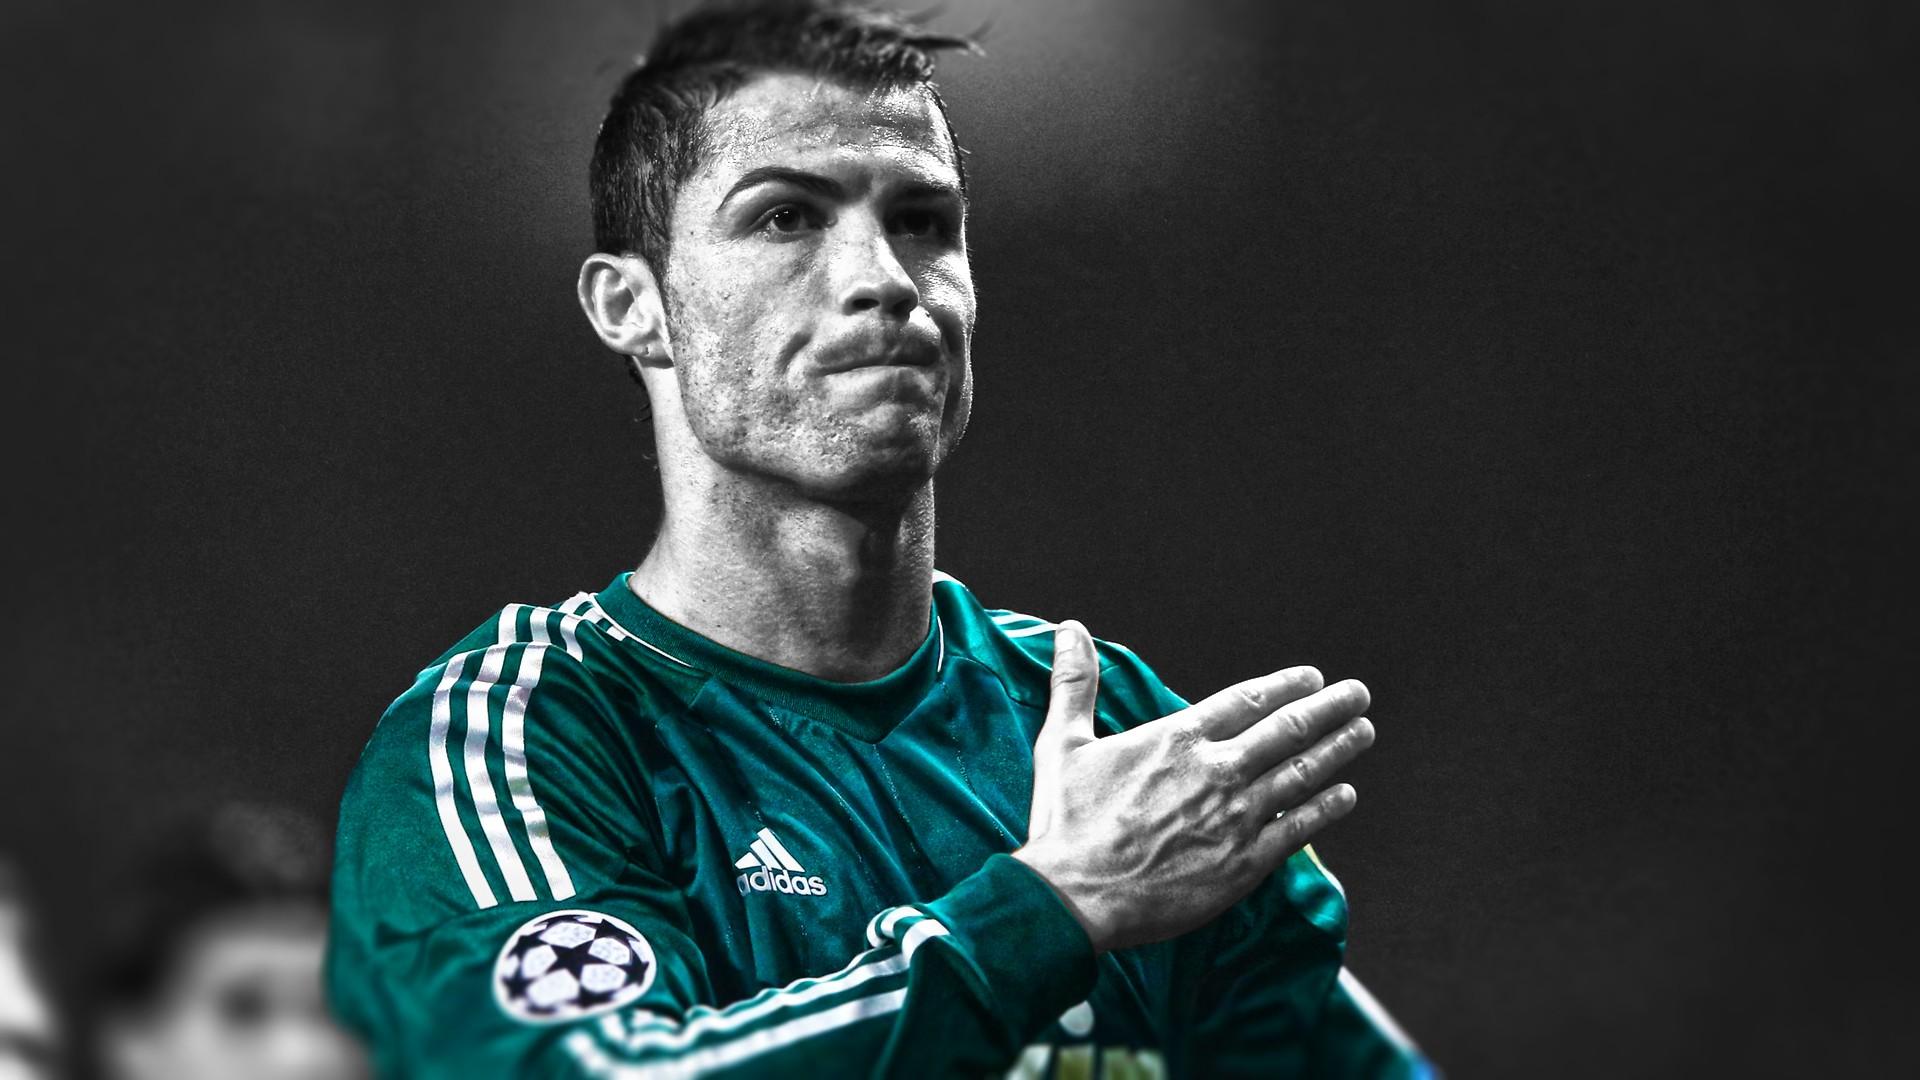 Cristiano Ronaldo HD Wallpapers 1920x1080